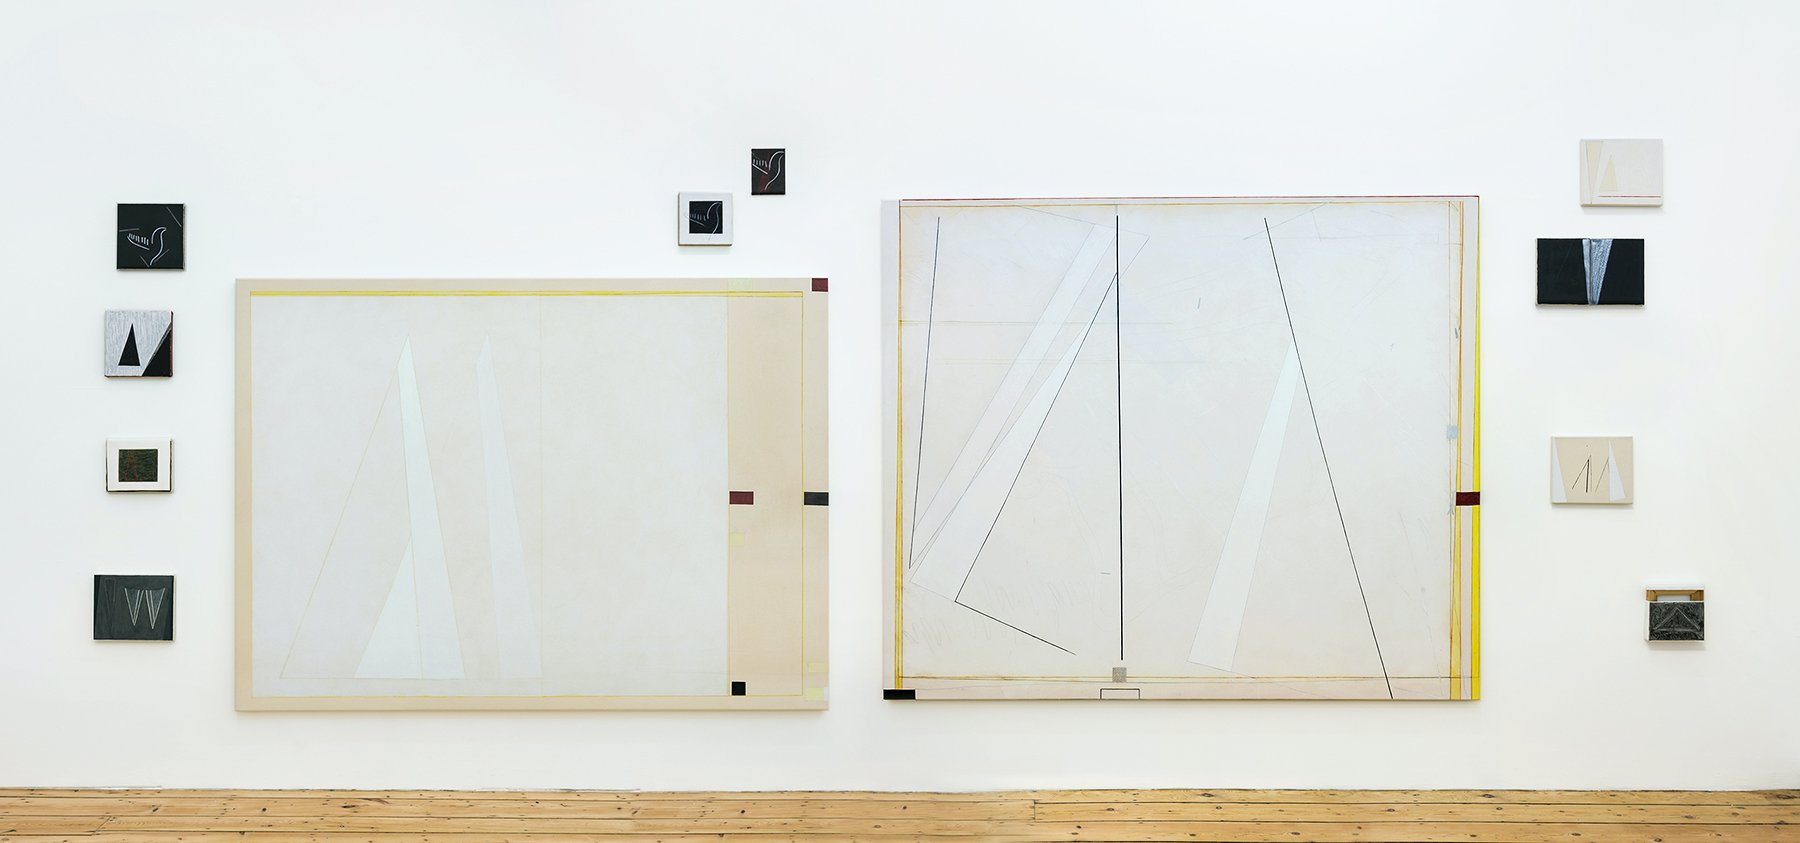 Maureen Paley Studio M Avis Newman 1